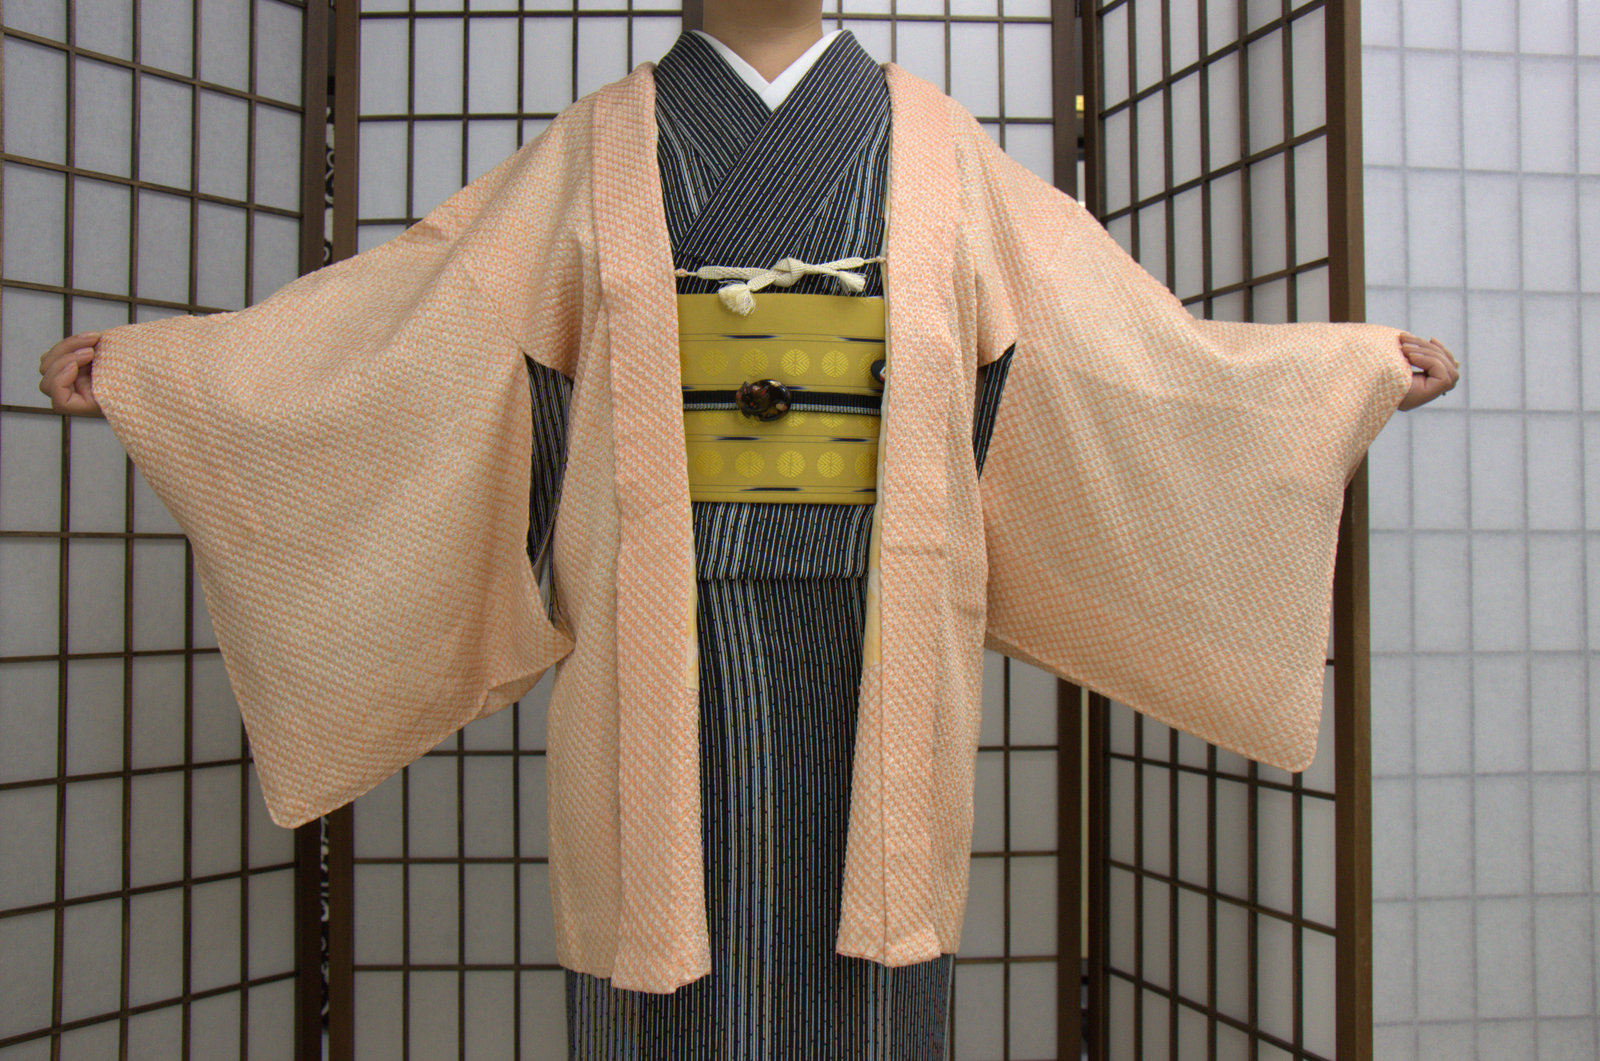 (Fuente: http://cache.kimokame.com/2012/03/Shibori_Haori_used2.jpg)